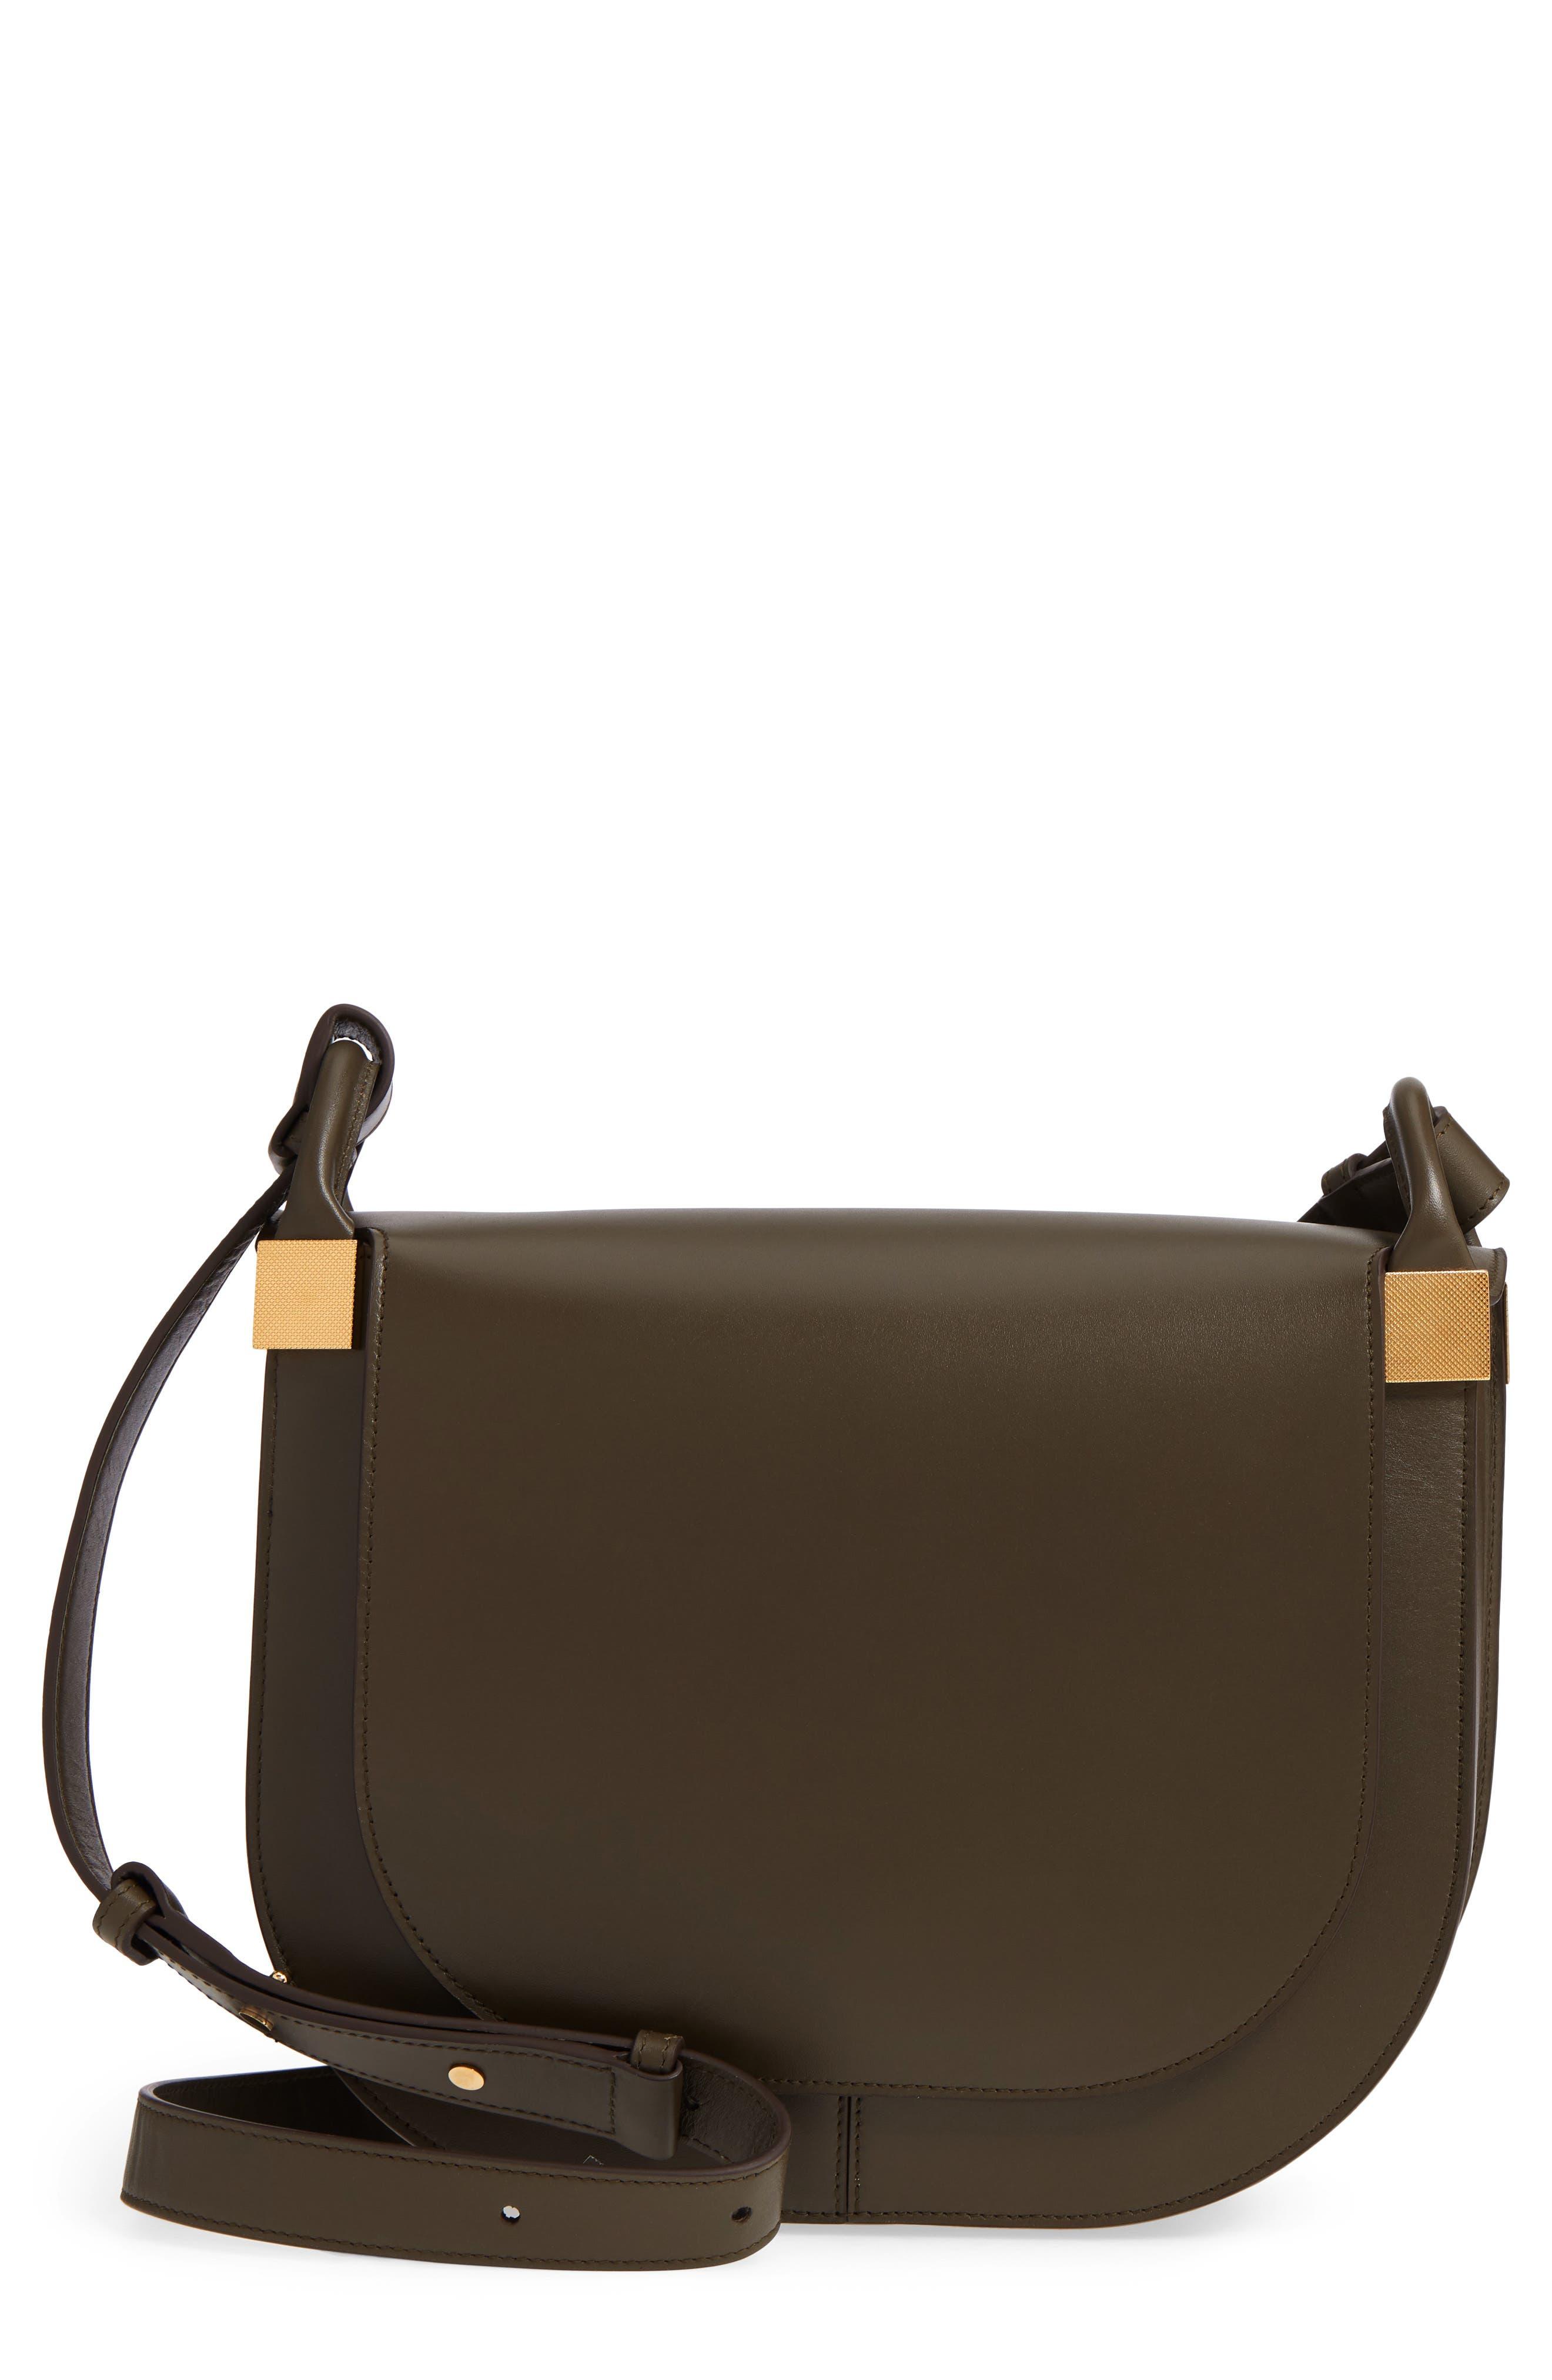 Alternate Image 1 Selected - Victoria Beckham Half Moon Box Crossbody Bag